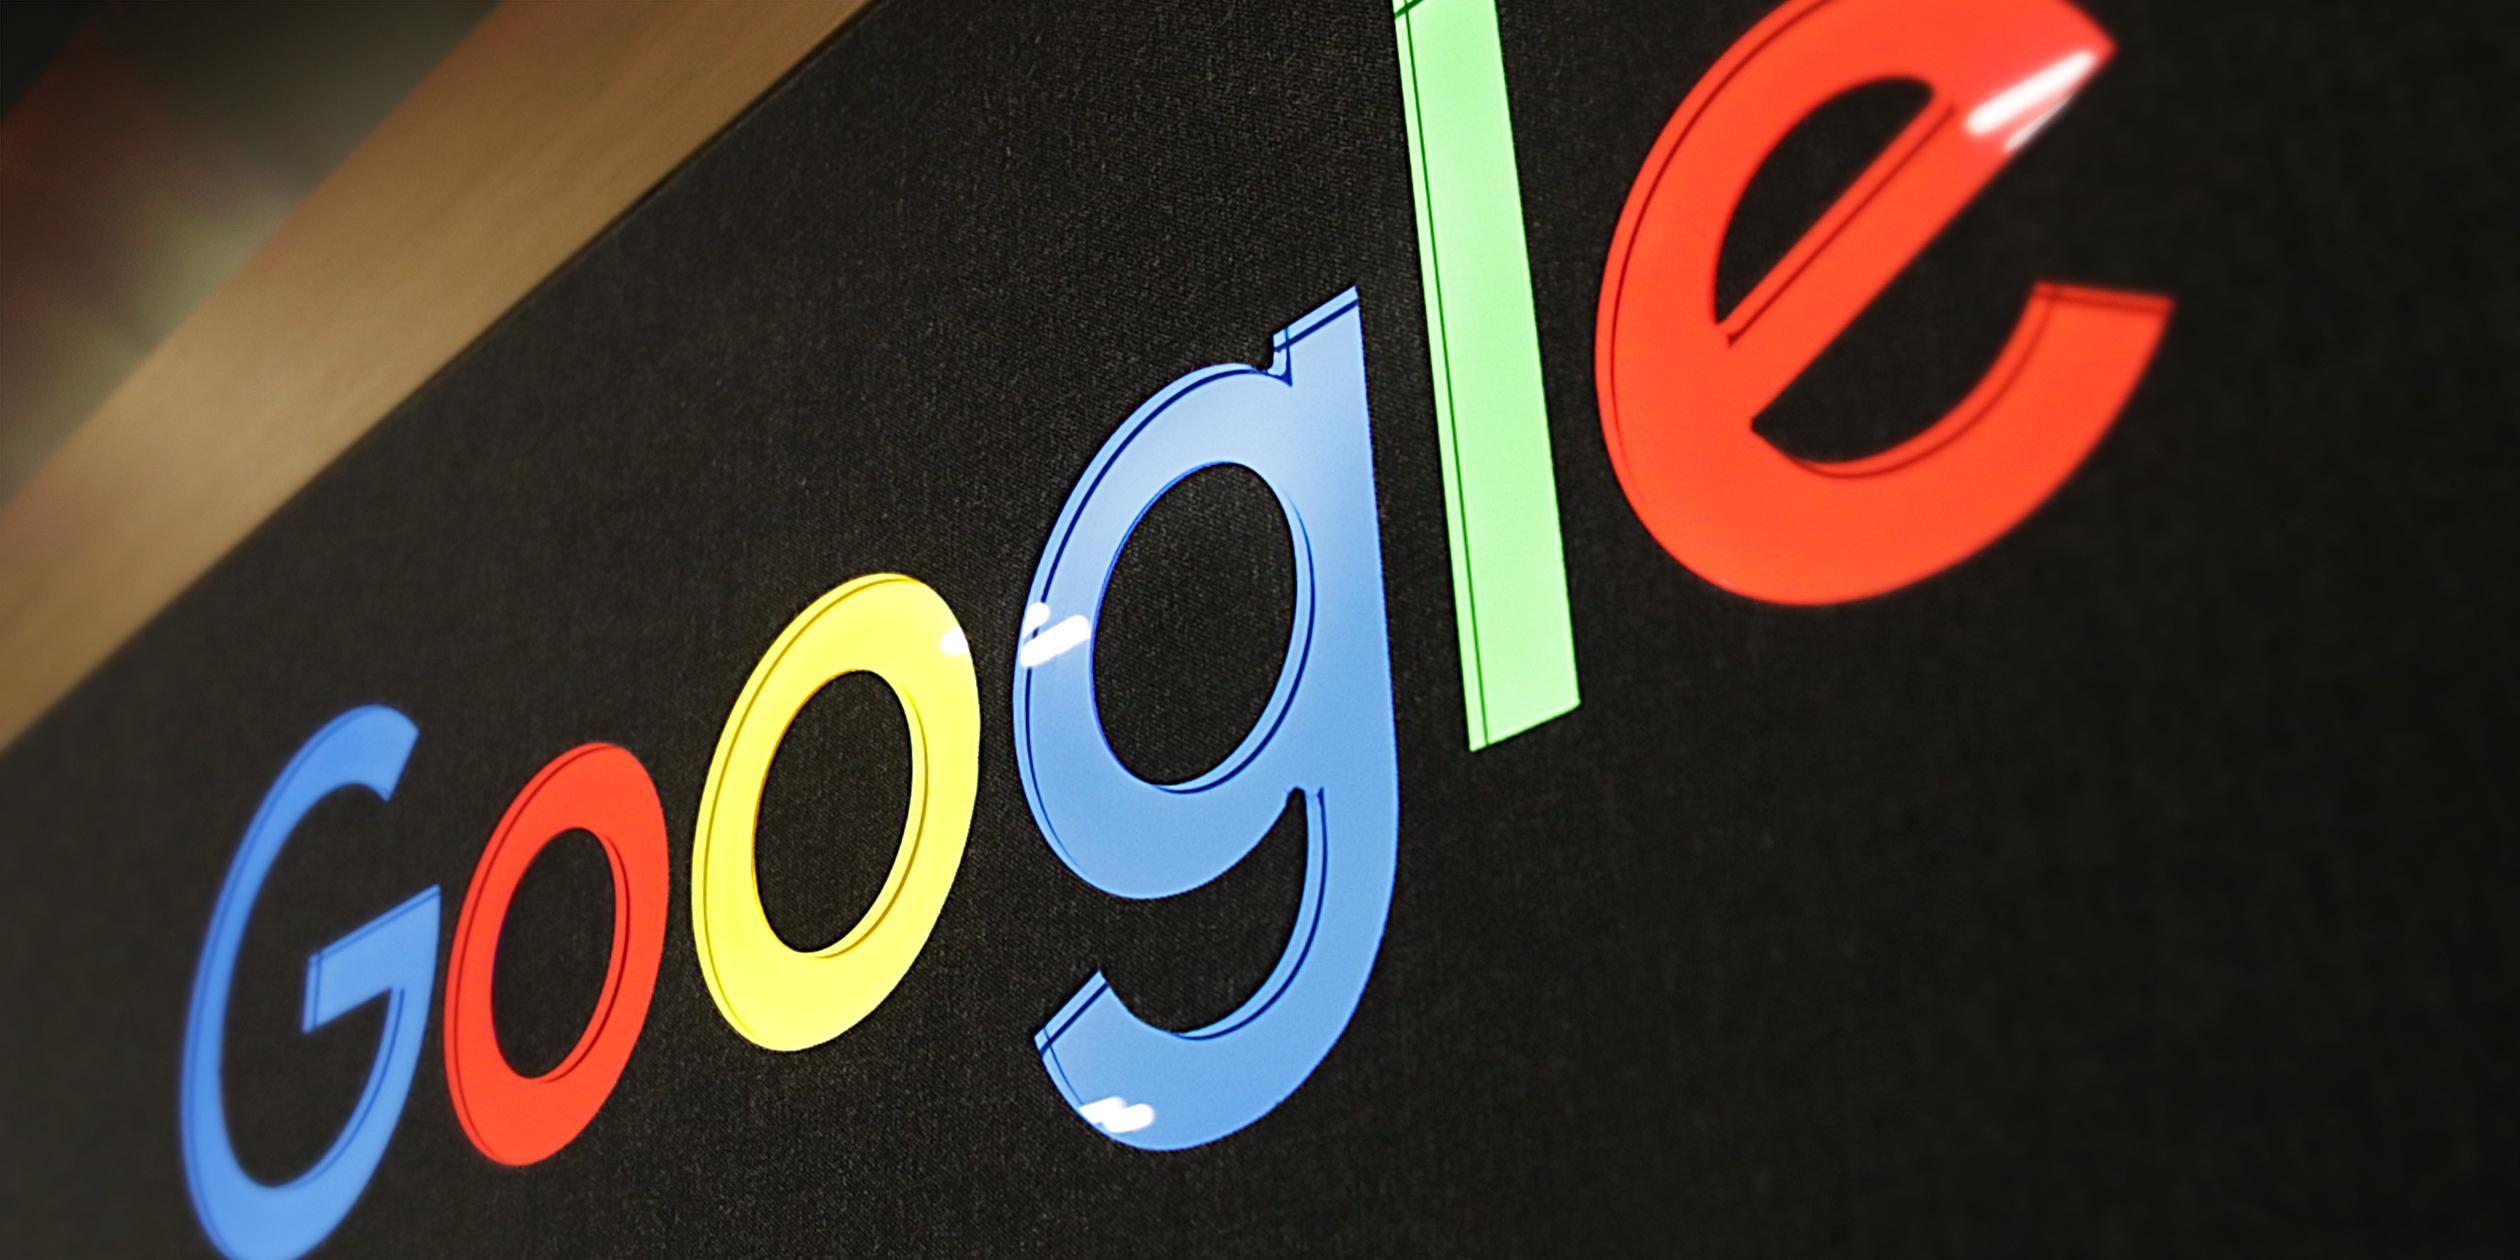 Colorful Google logo on display above Google shop